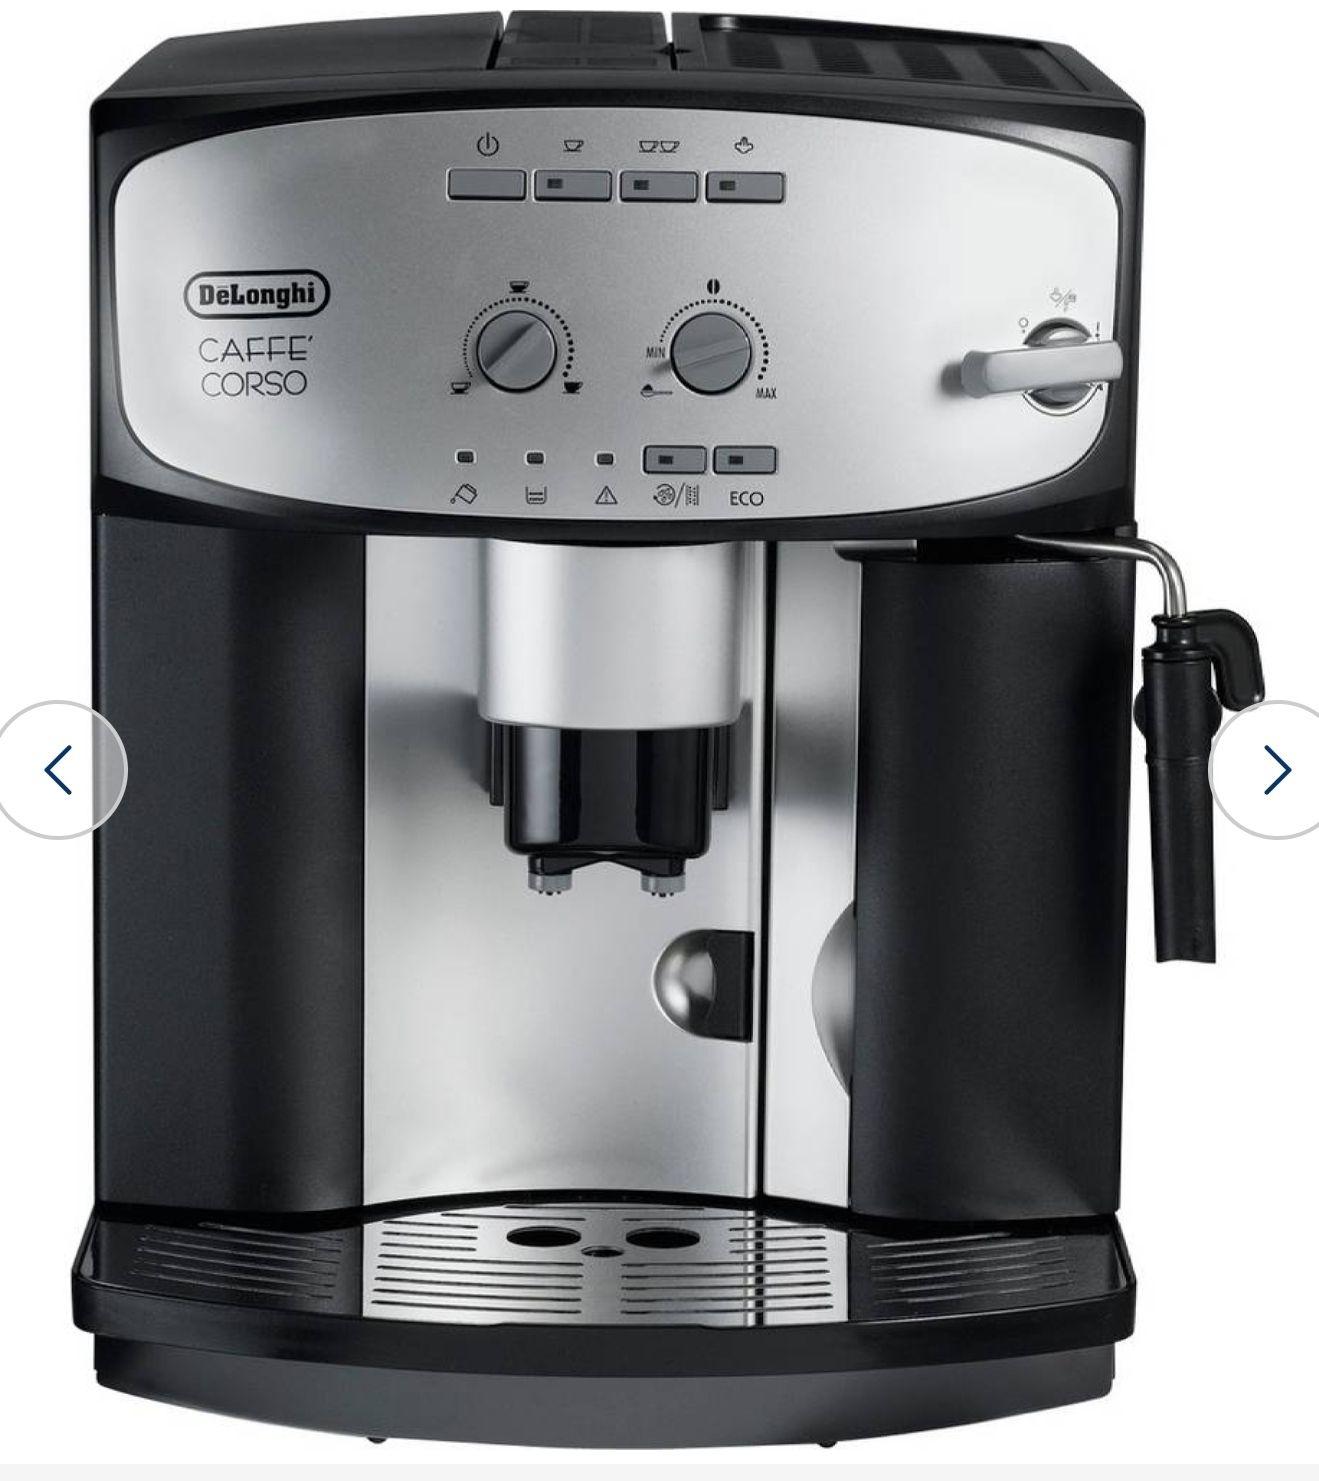 De'Longhi ESAM 2800 Cafe Corso Bean to Cup Coffee Machine £199.99 at Argos